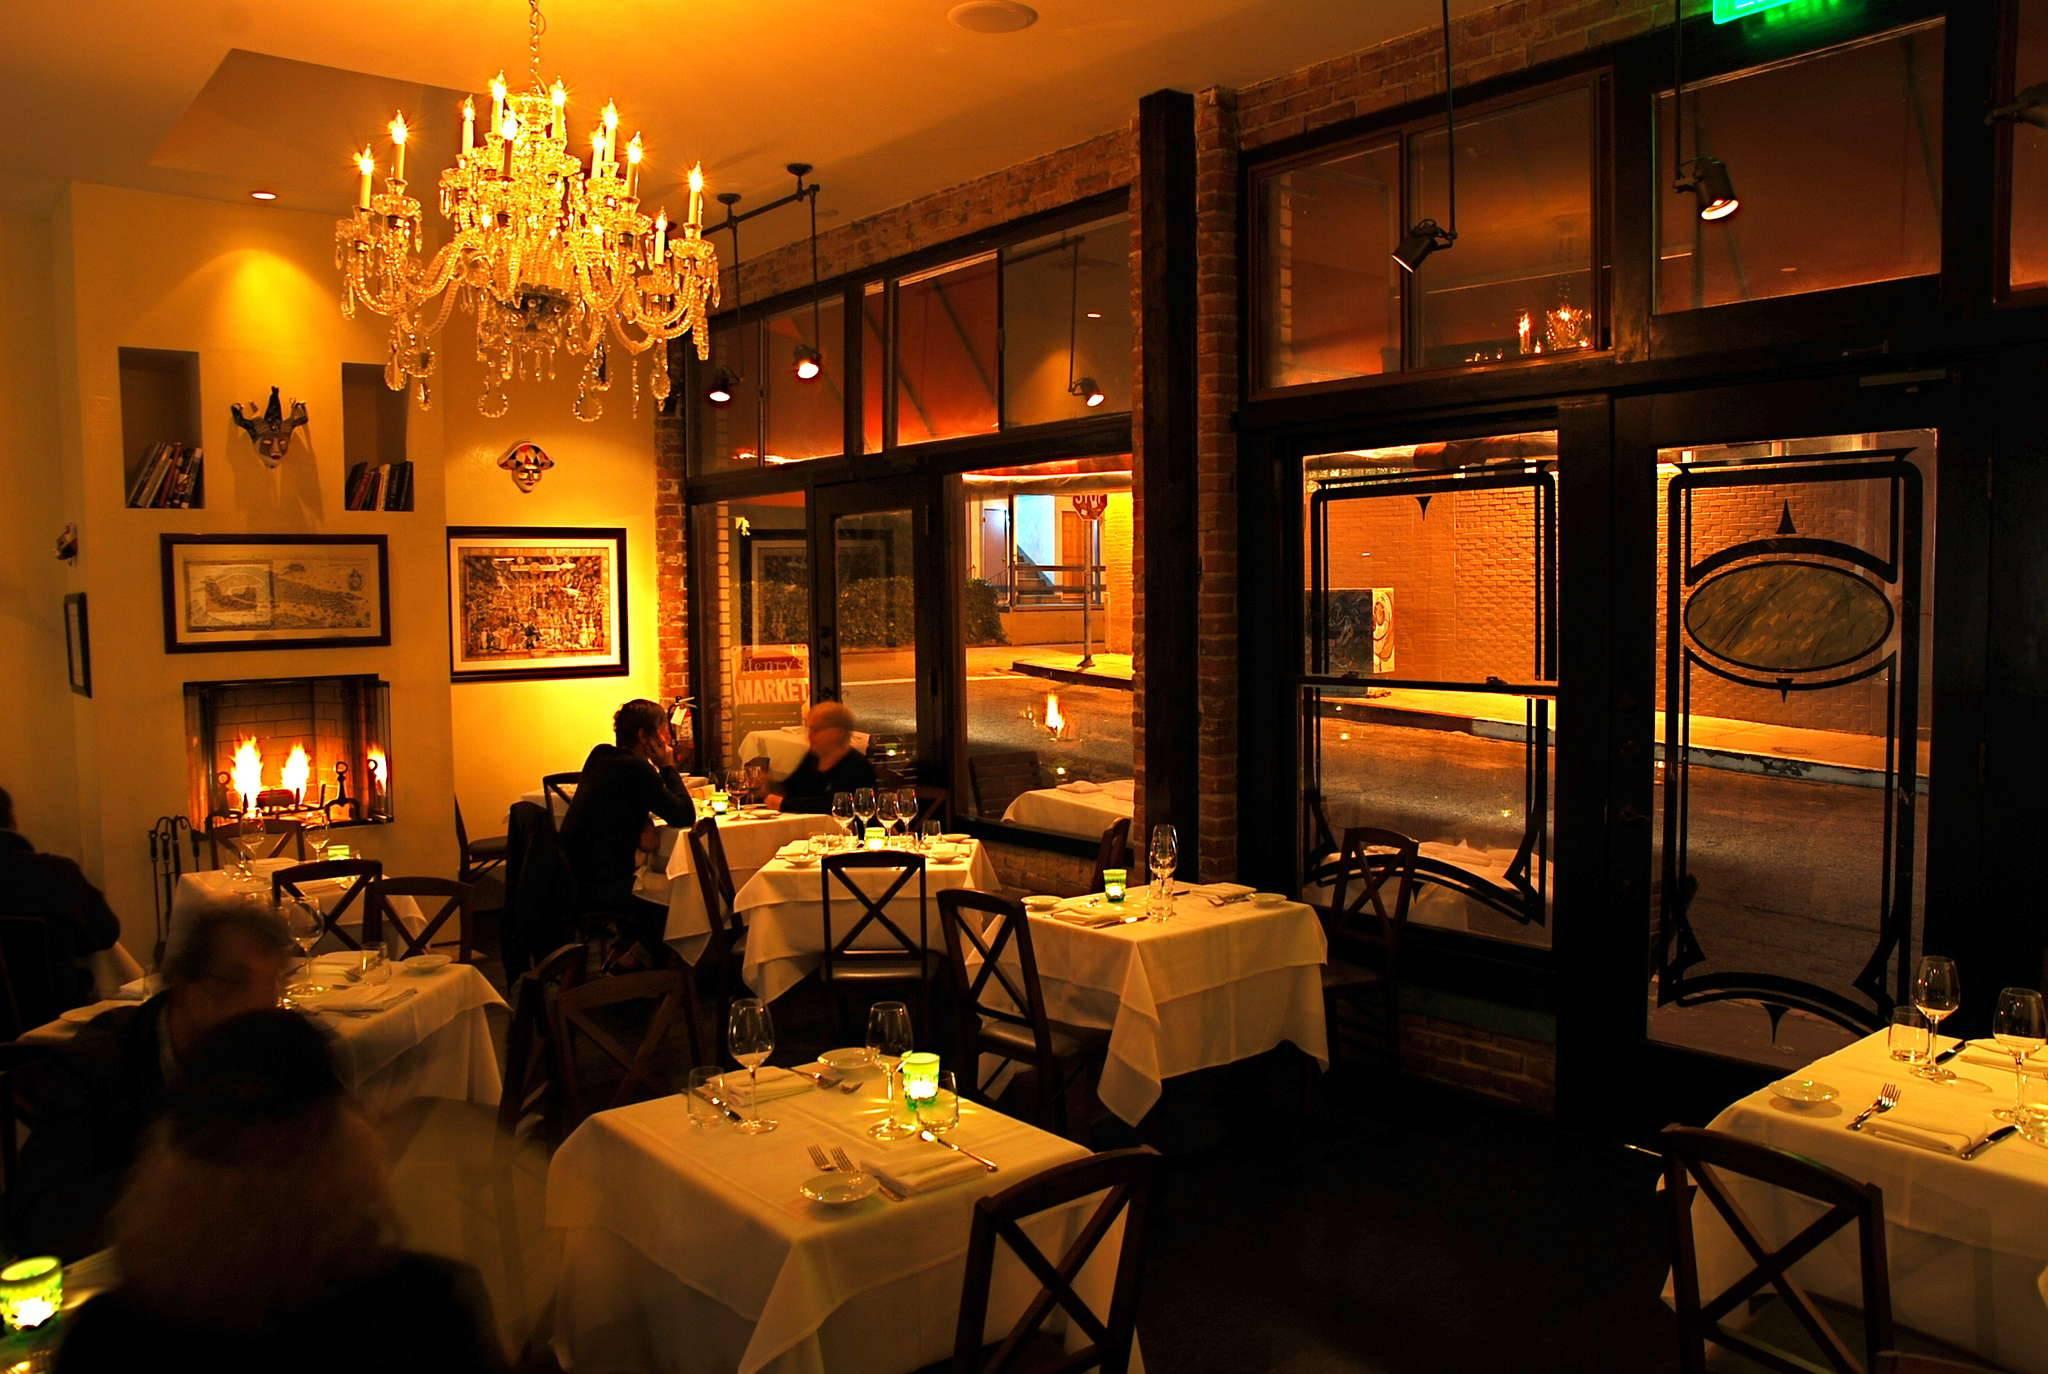 Ciao Bella The Top 5 Italian Restaurants In Los Angeles